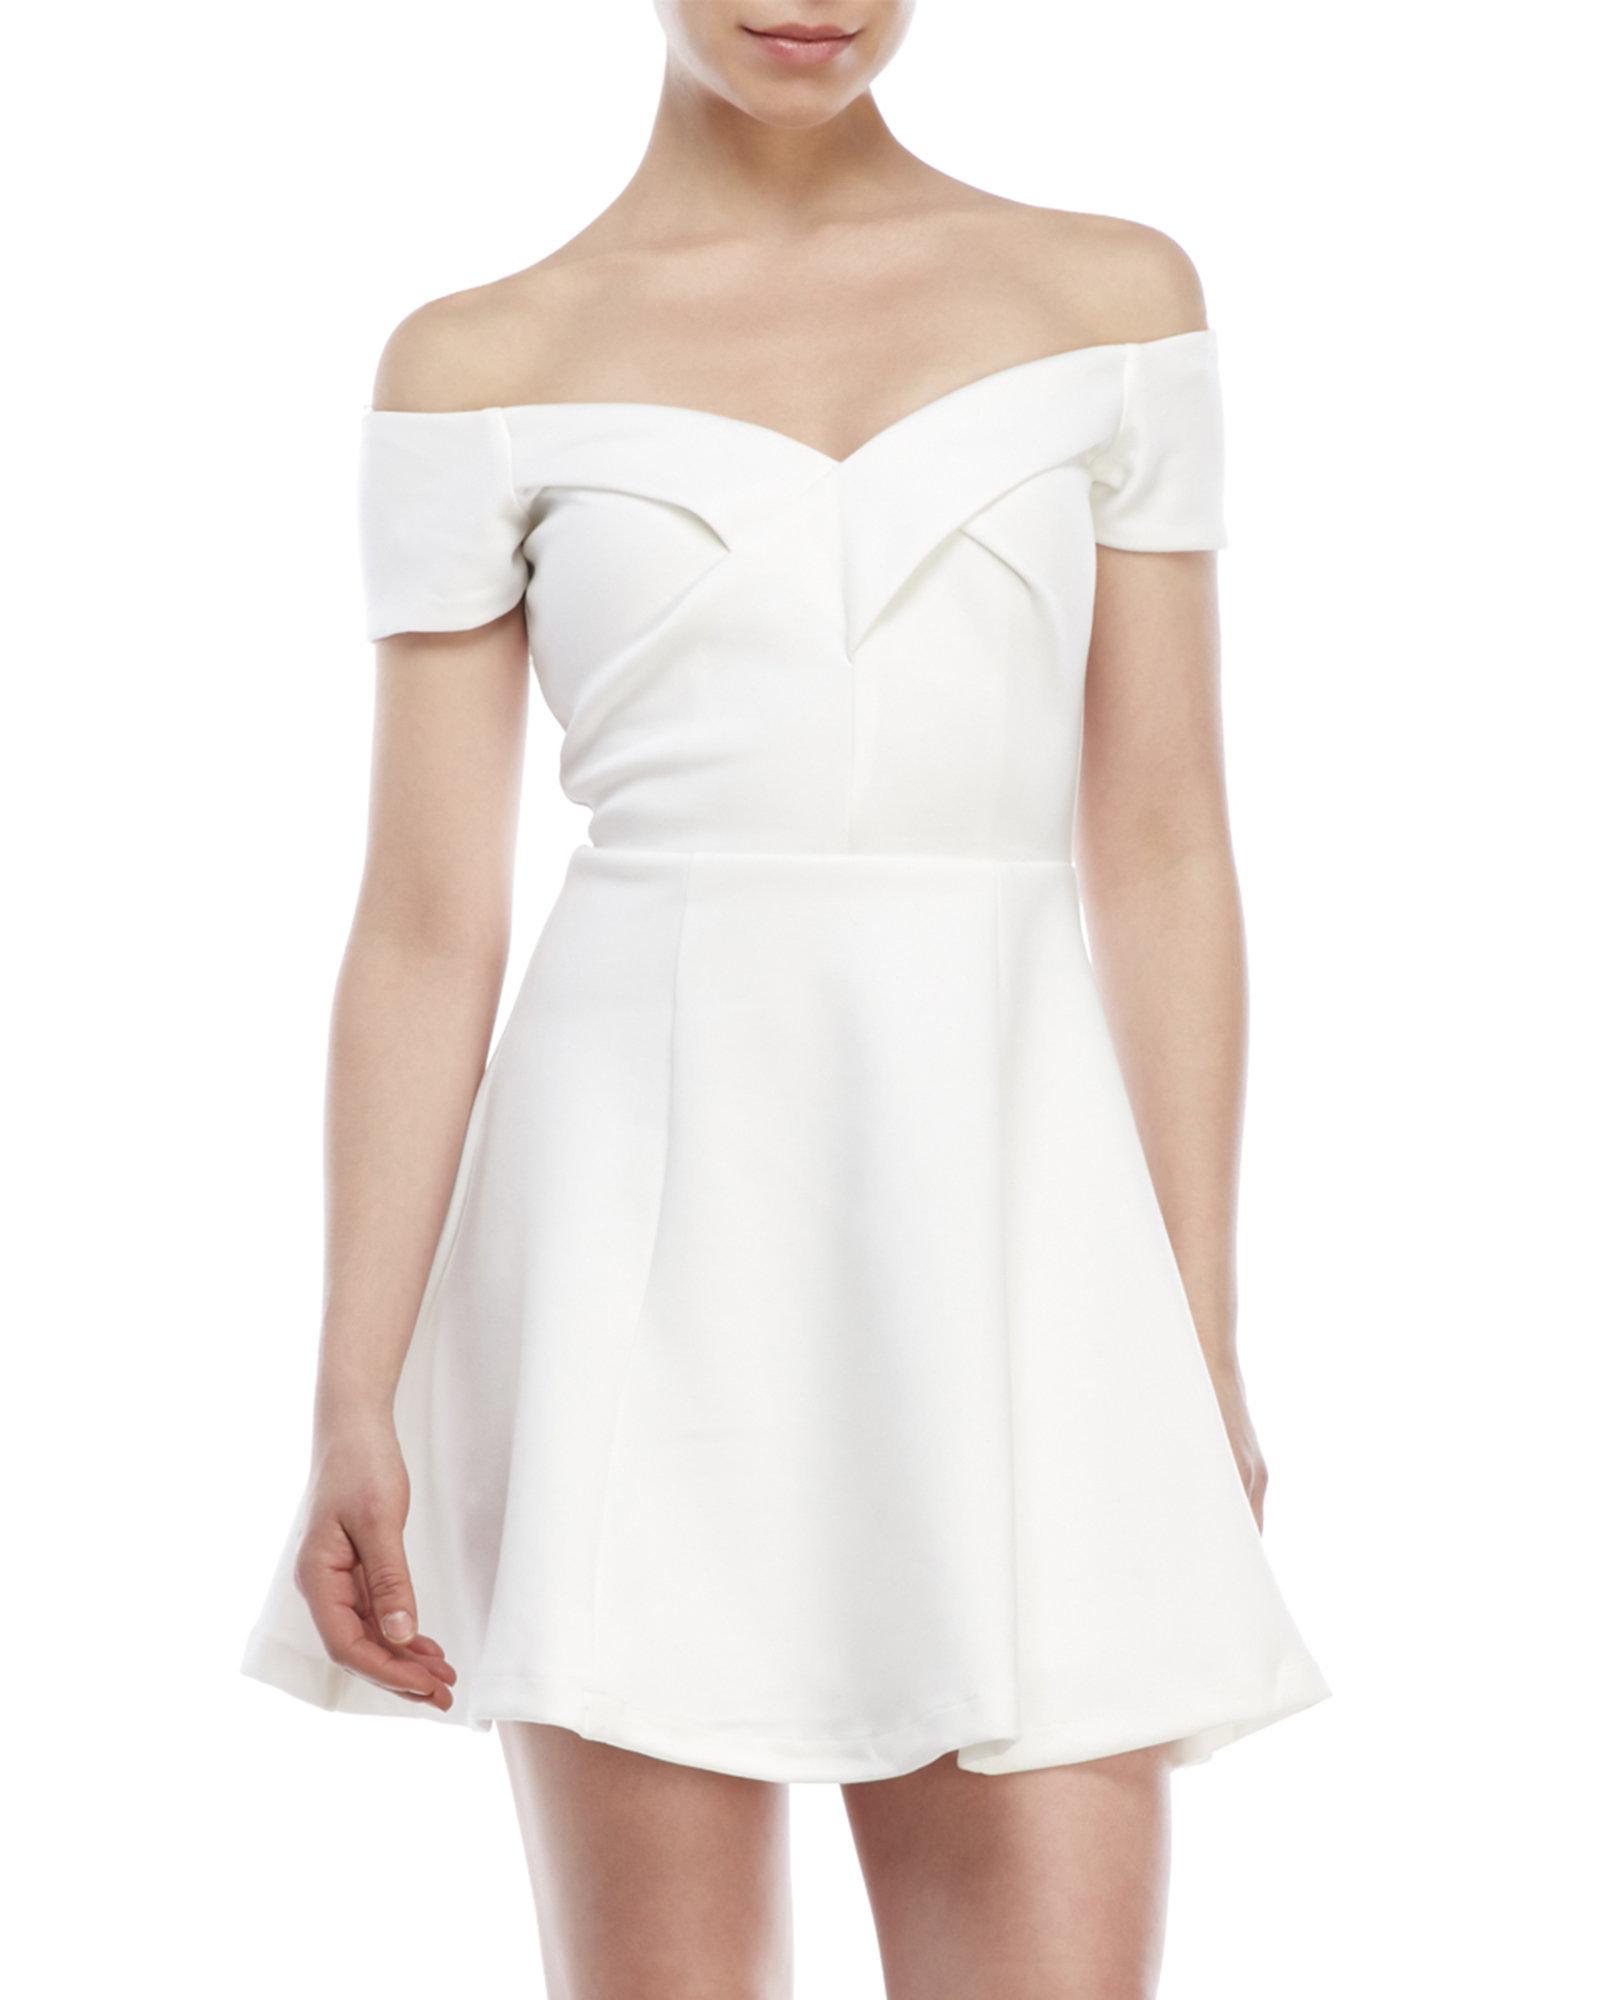 White off the shoulder skater dress